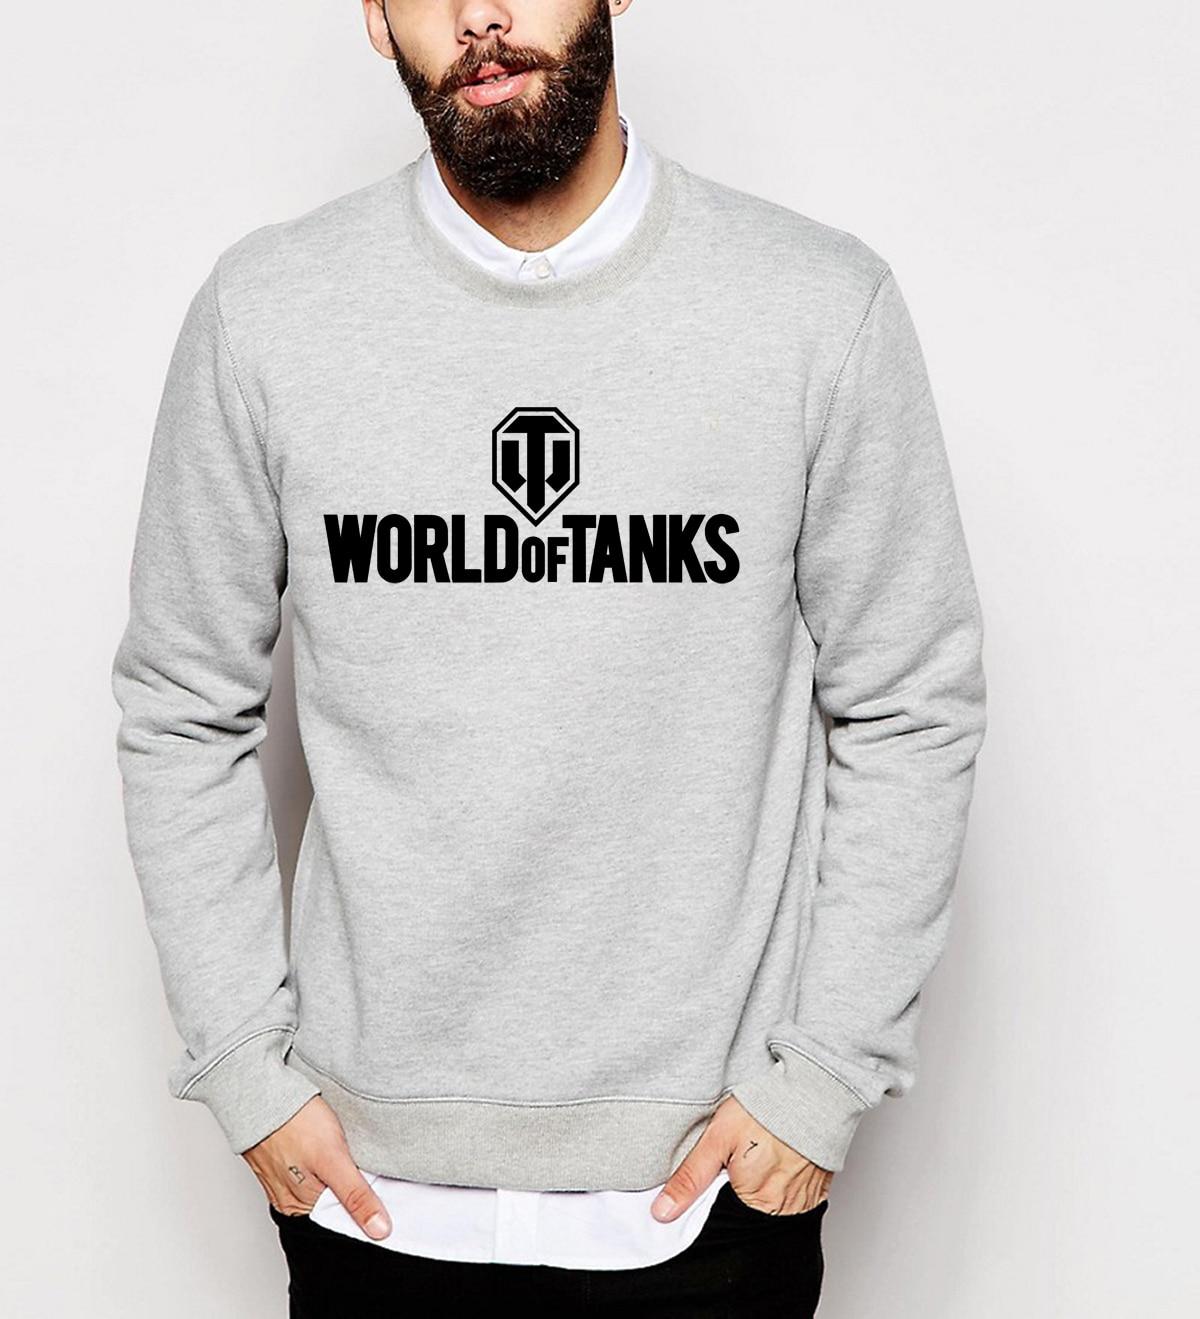 new arrival 2019 fall winter men hoodies funny bodybuilding sweatshirts male brand clothing hip hop streetwear tracksuits kpop